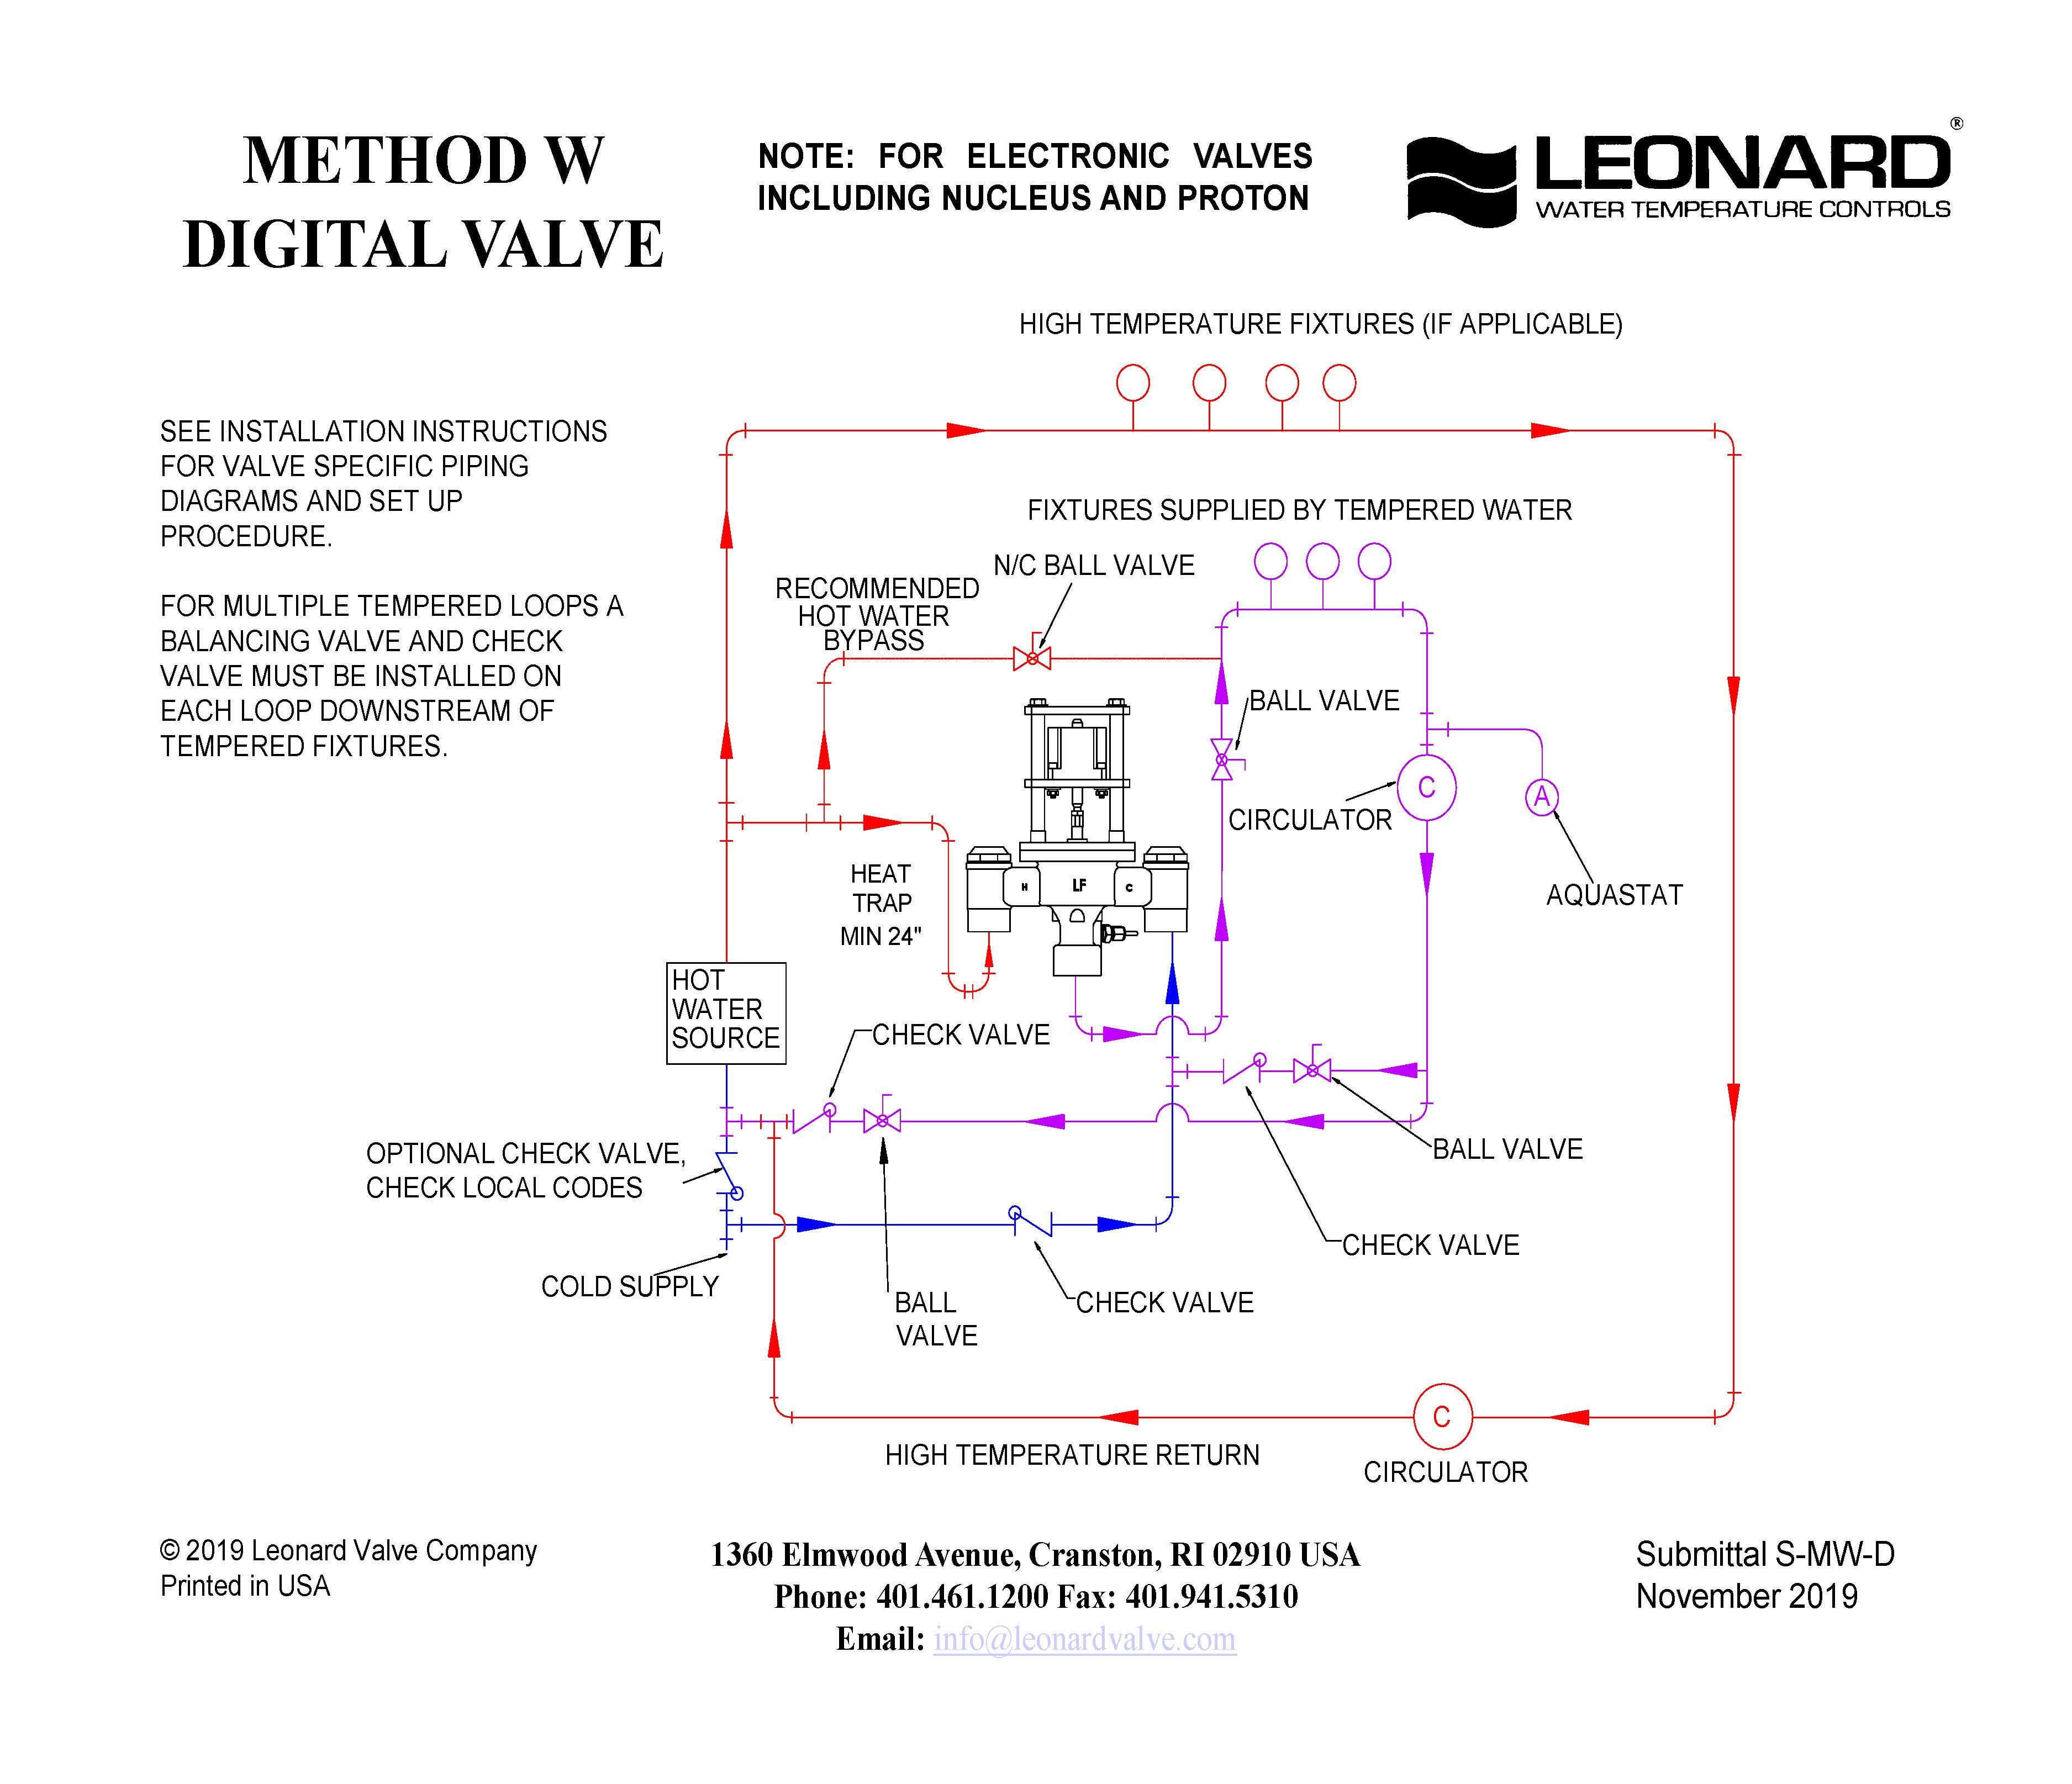 Radiant Mixing Valve Piping Diagram